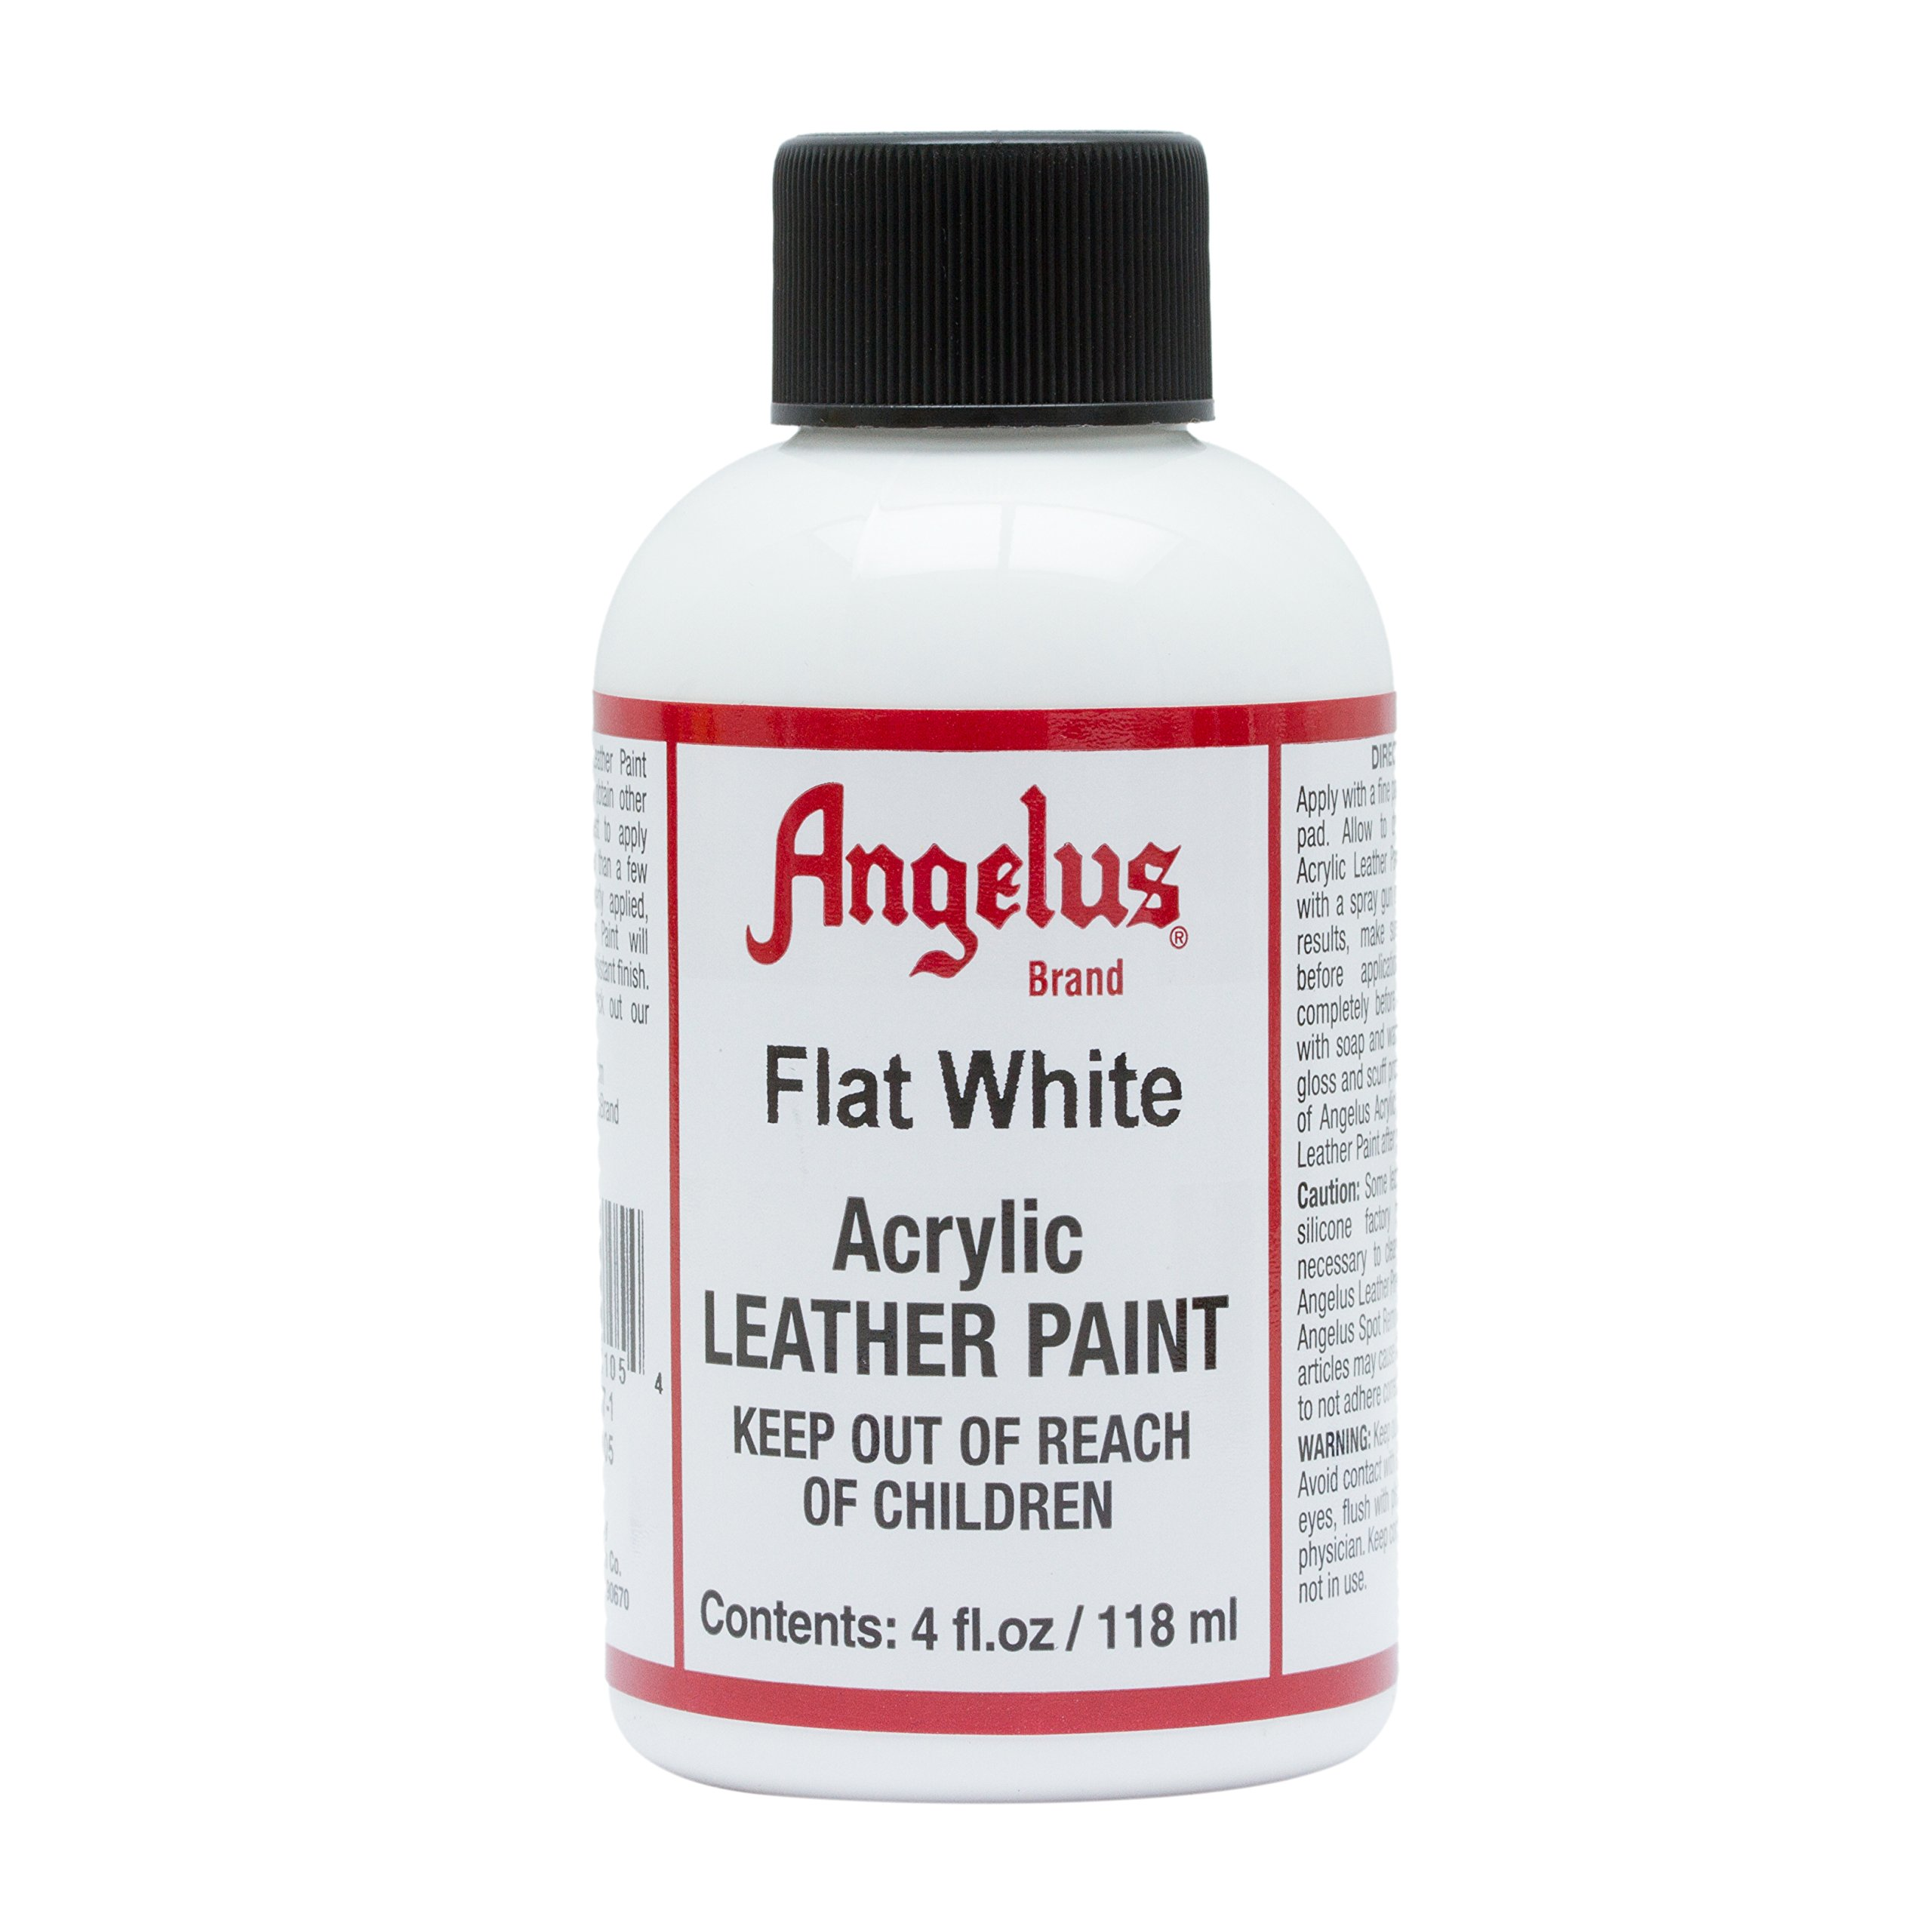 Angelus Brand Acrylic Leather Paint Waterproof 4oz - Flat White